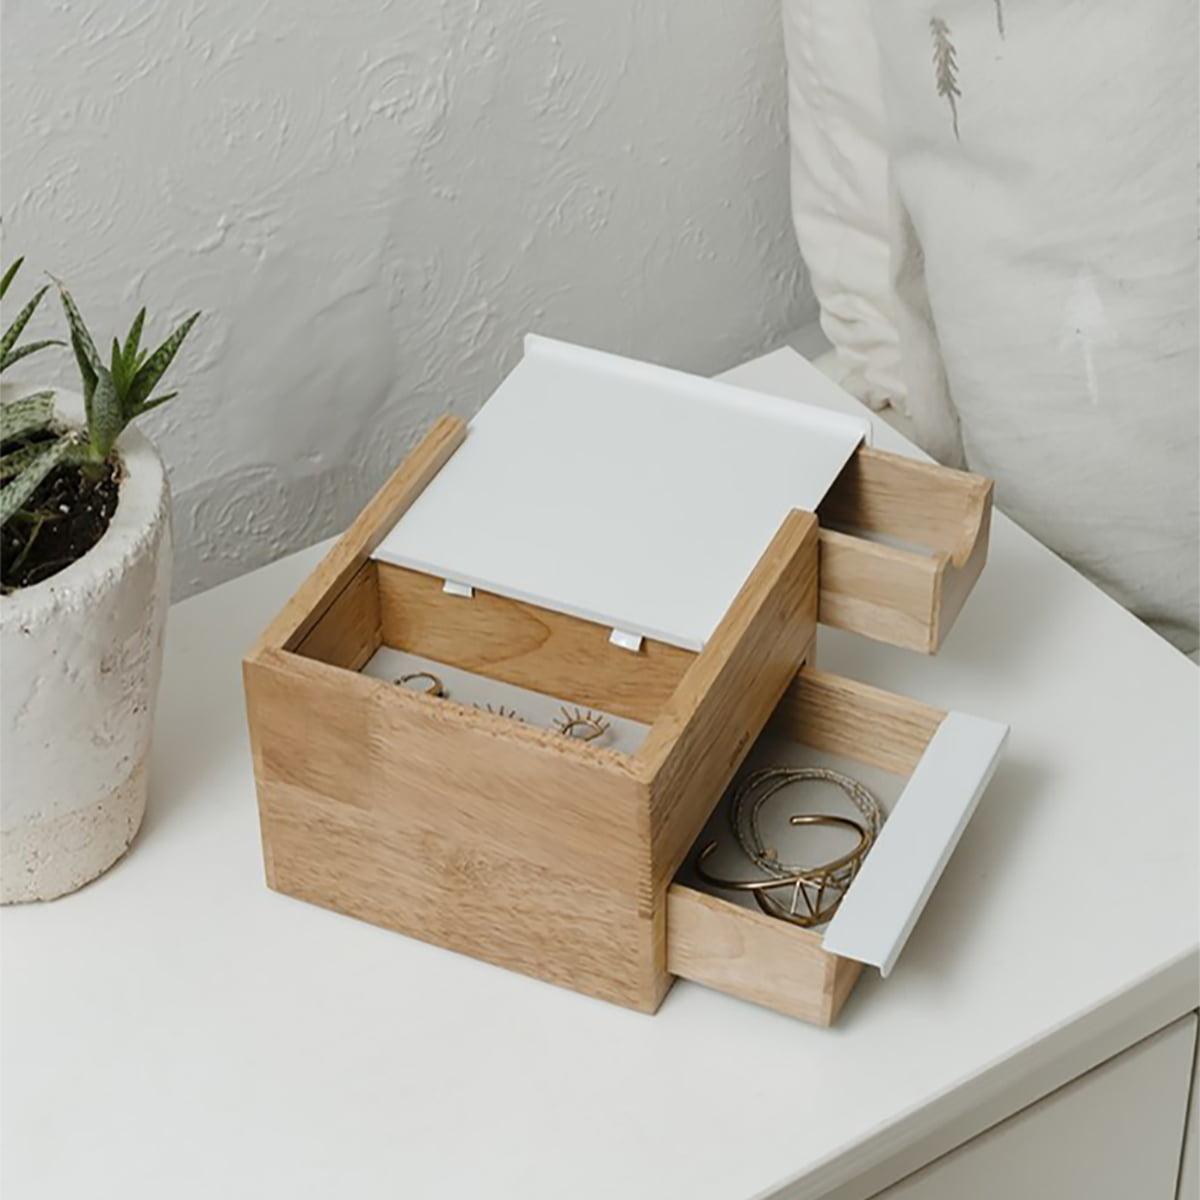 Umbra Jewelry Box Stowit mini holz